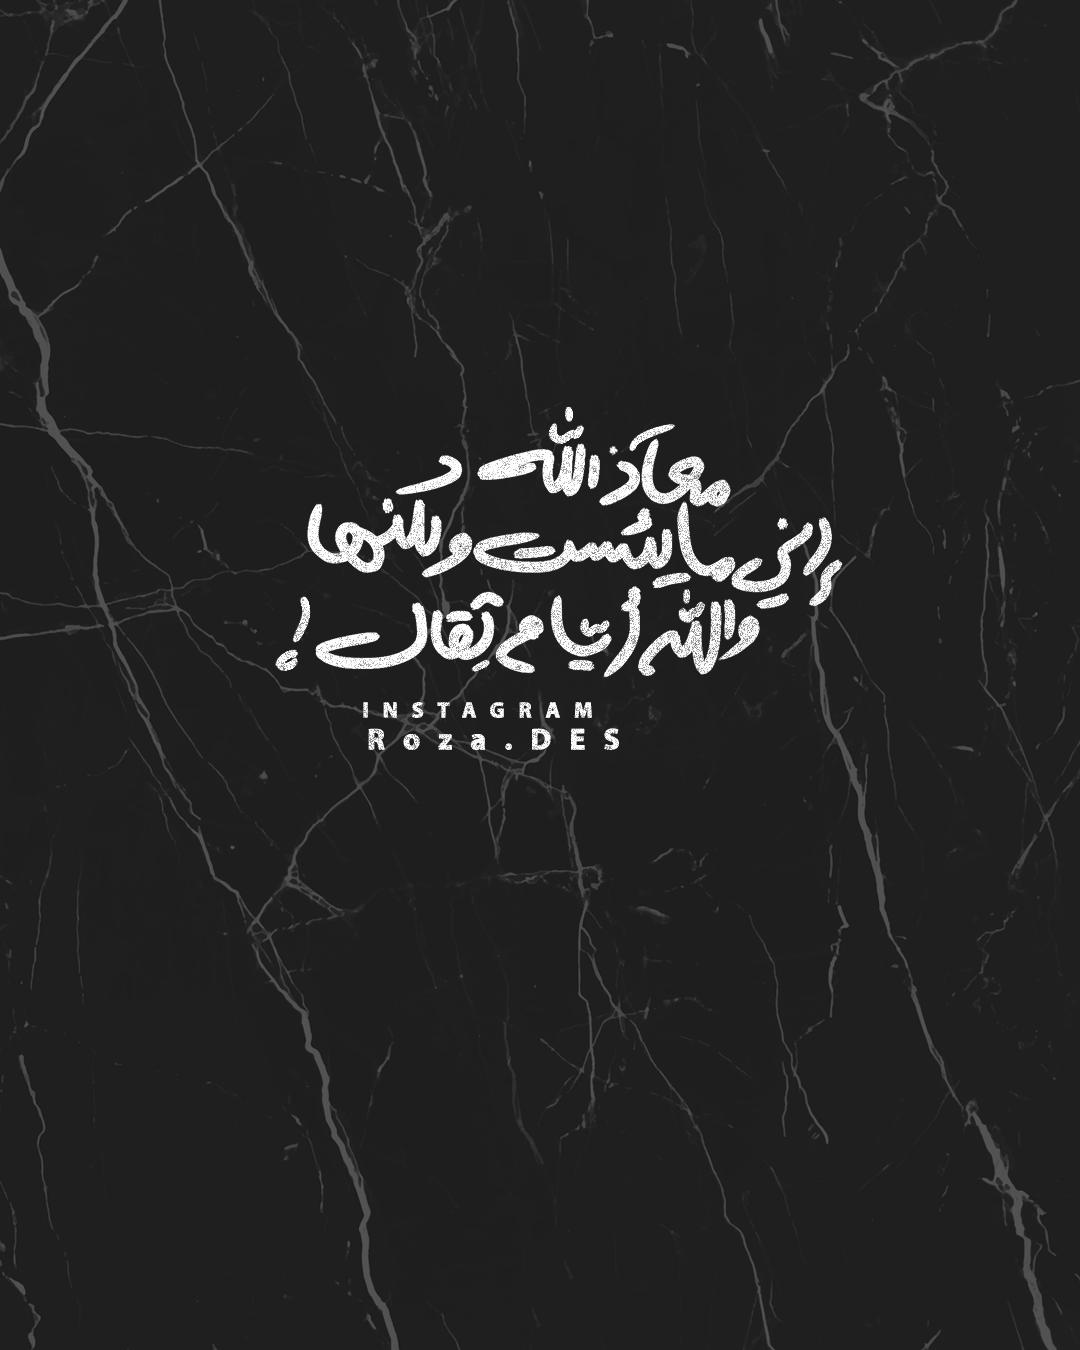 معاذ الله اني ما يئست ولكنها والله أيام ثقال Words Quotes Islamic Quotes Sweet Words